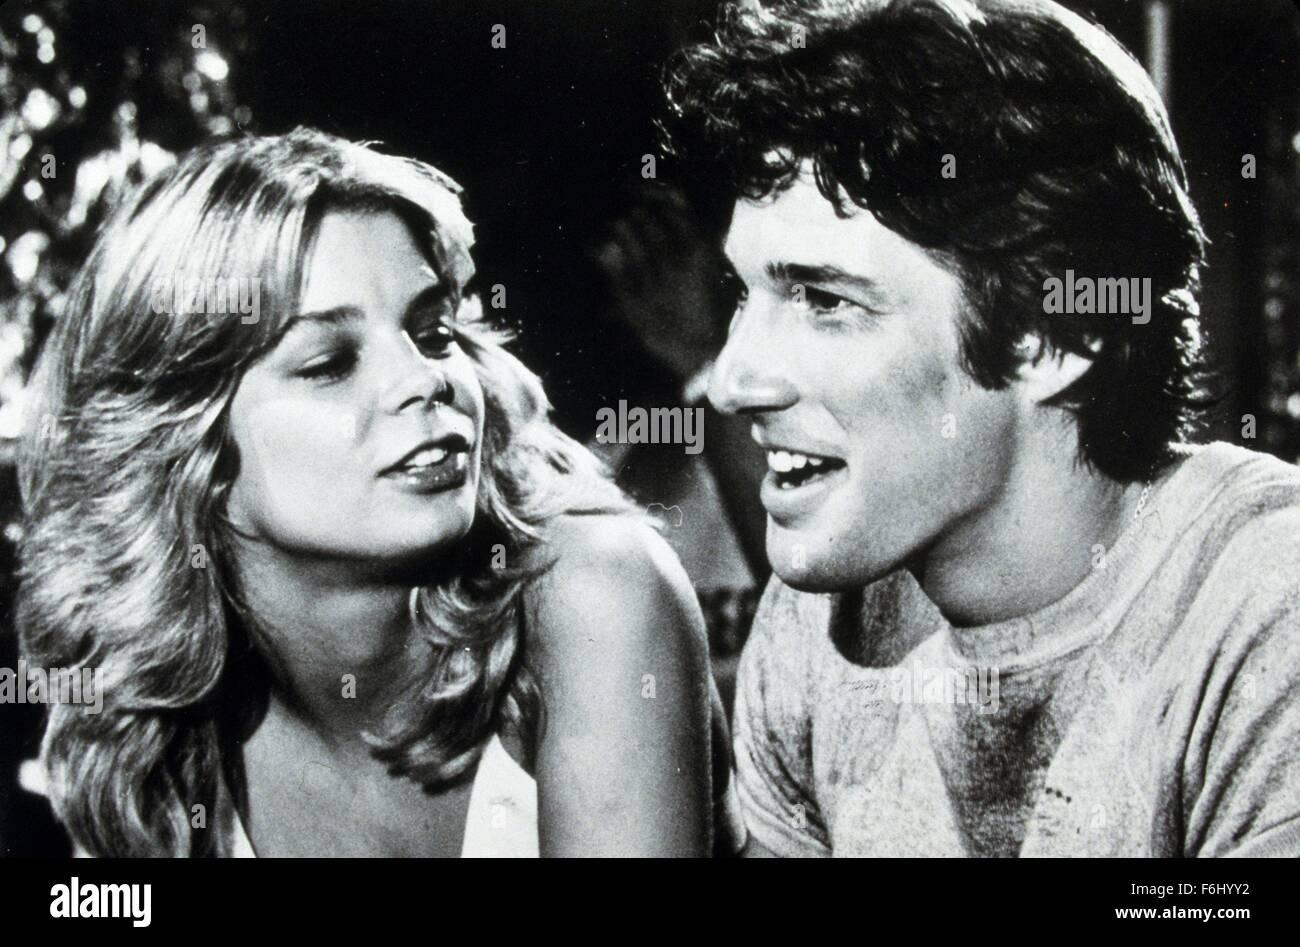 1978 film title bloodbrothers director robert mulligan